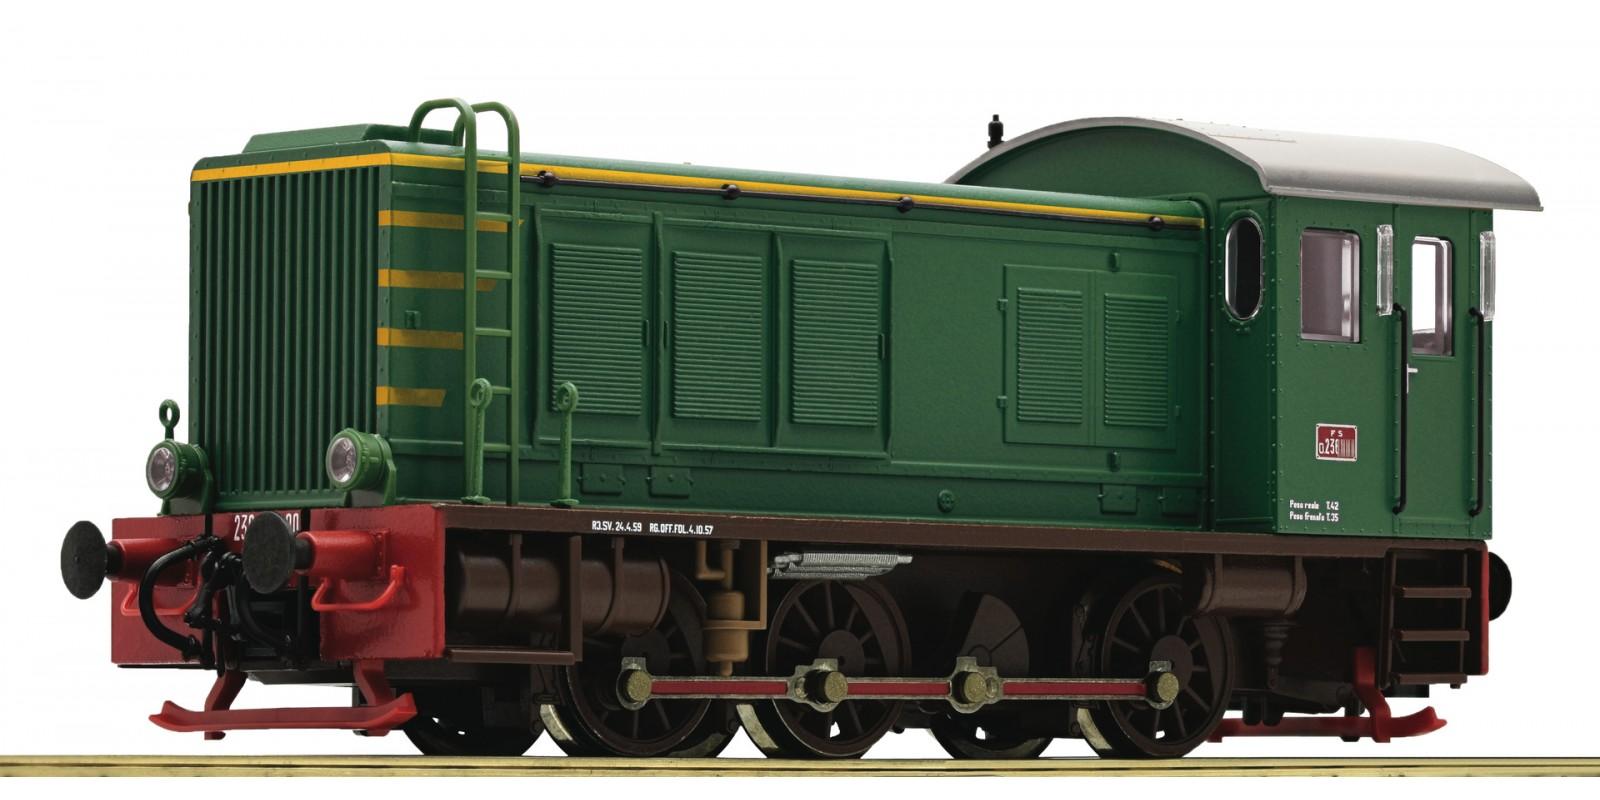 RO72810 - Diesel locomotive D236, FS